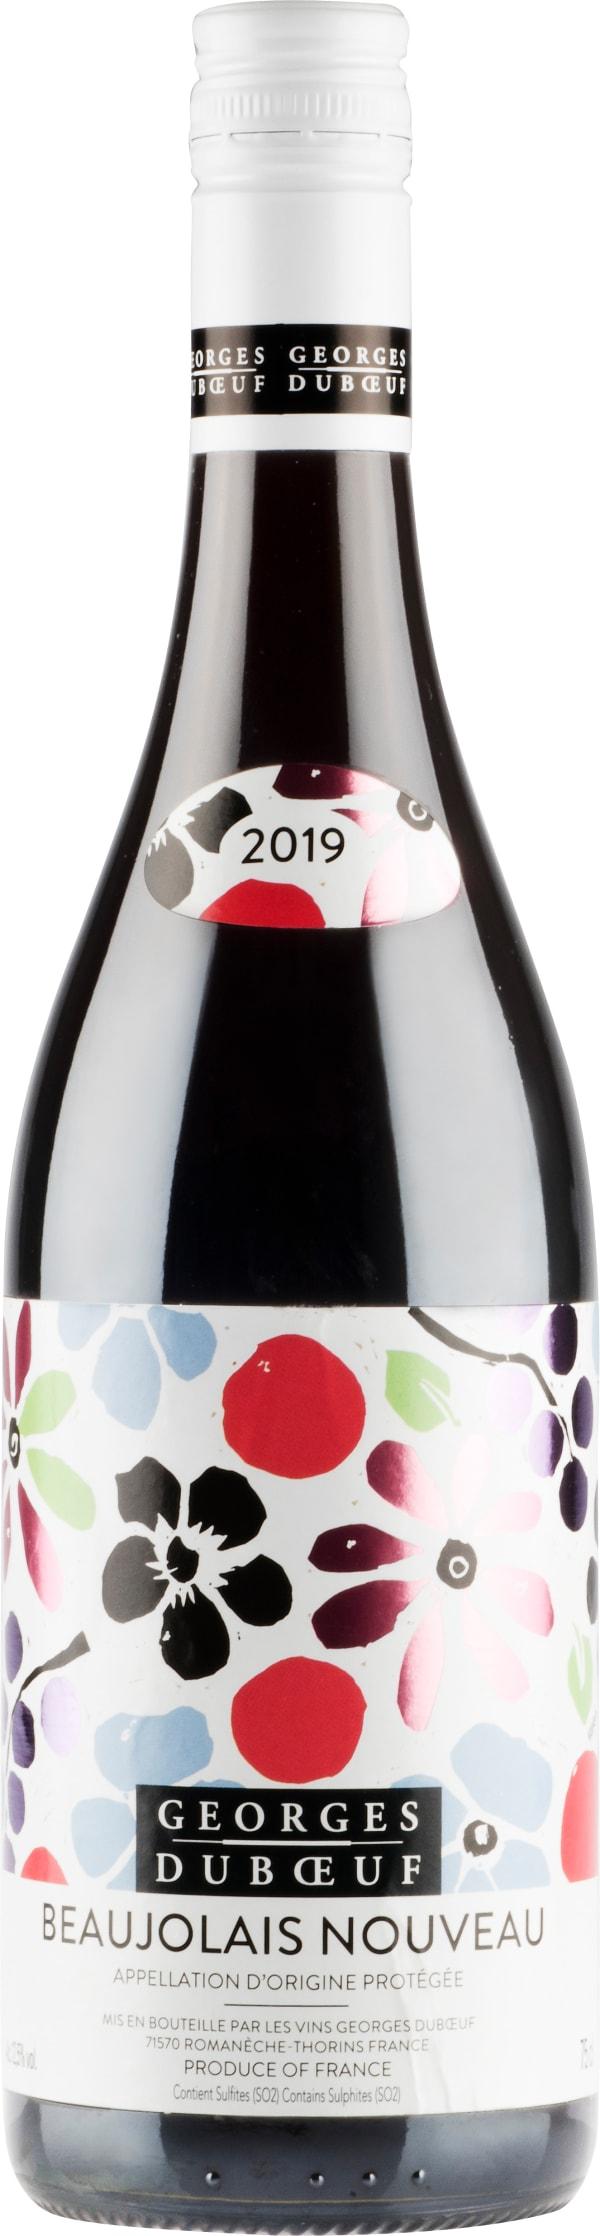 Georges Duboeuf Beaujolais Nouveau 2019